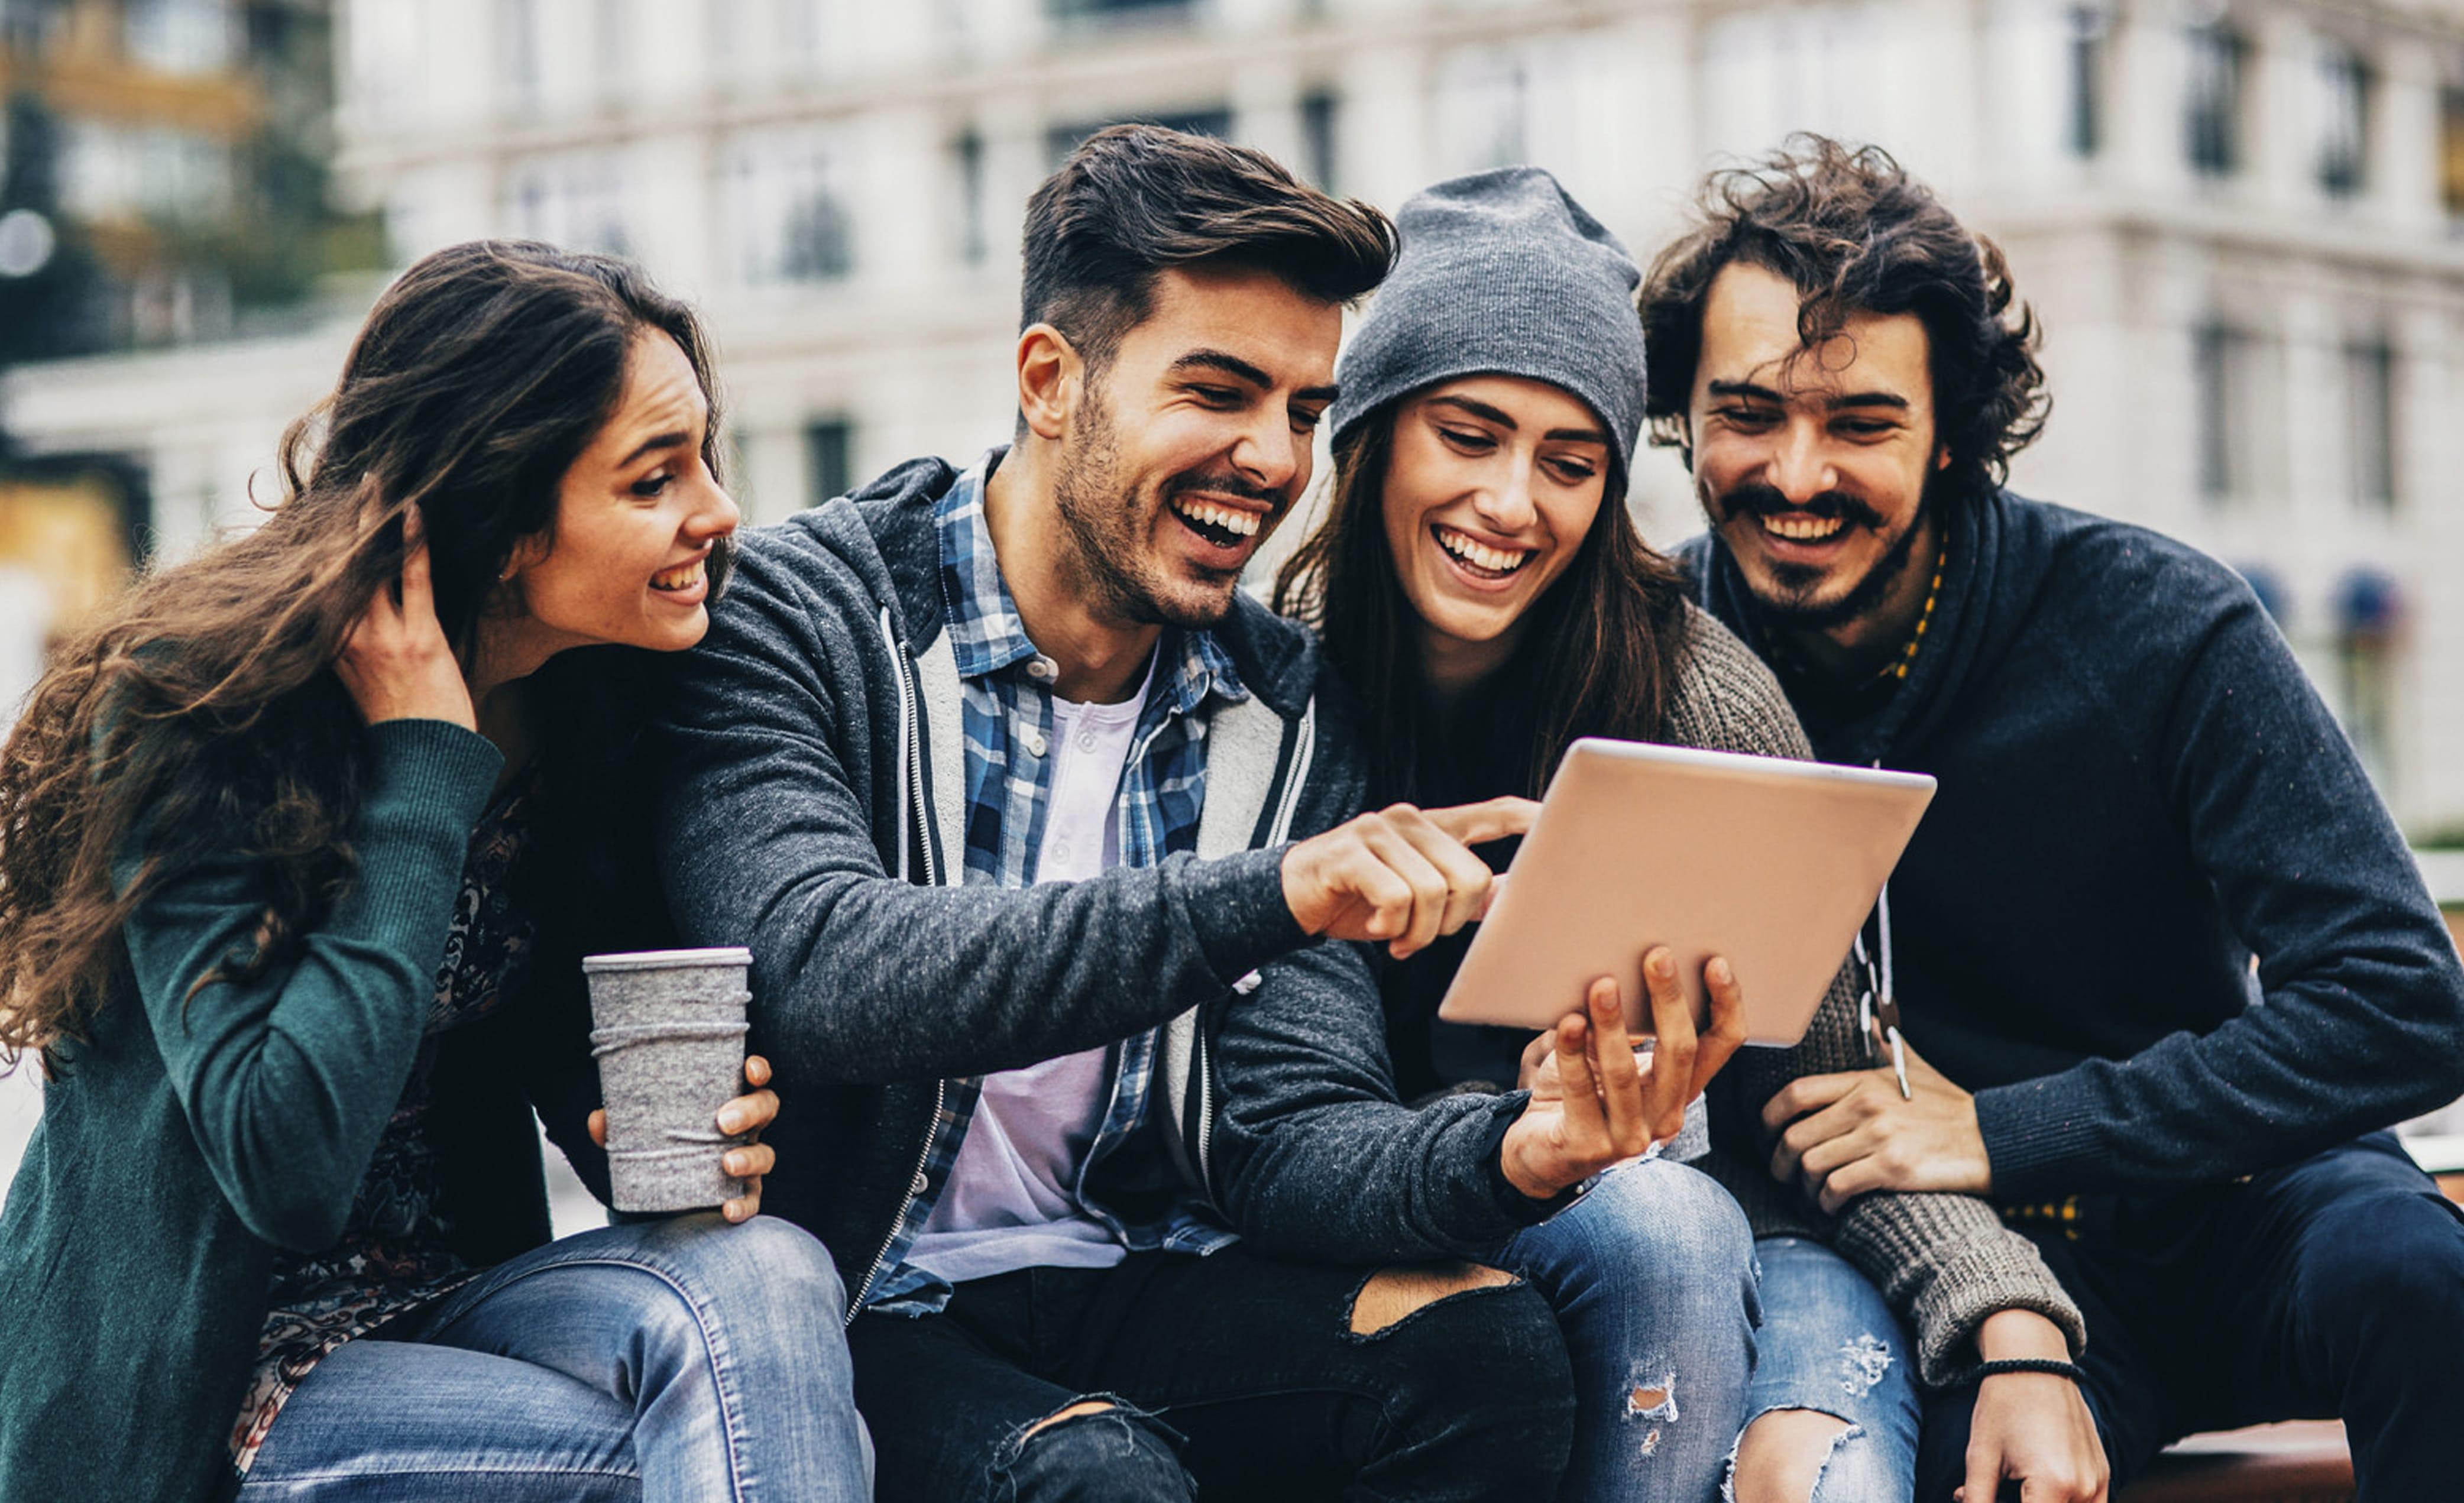 Alcuni consigli pratici per vendere ai Millennials